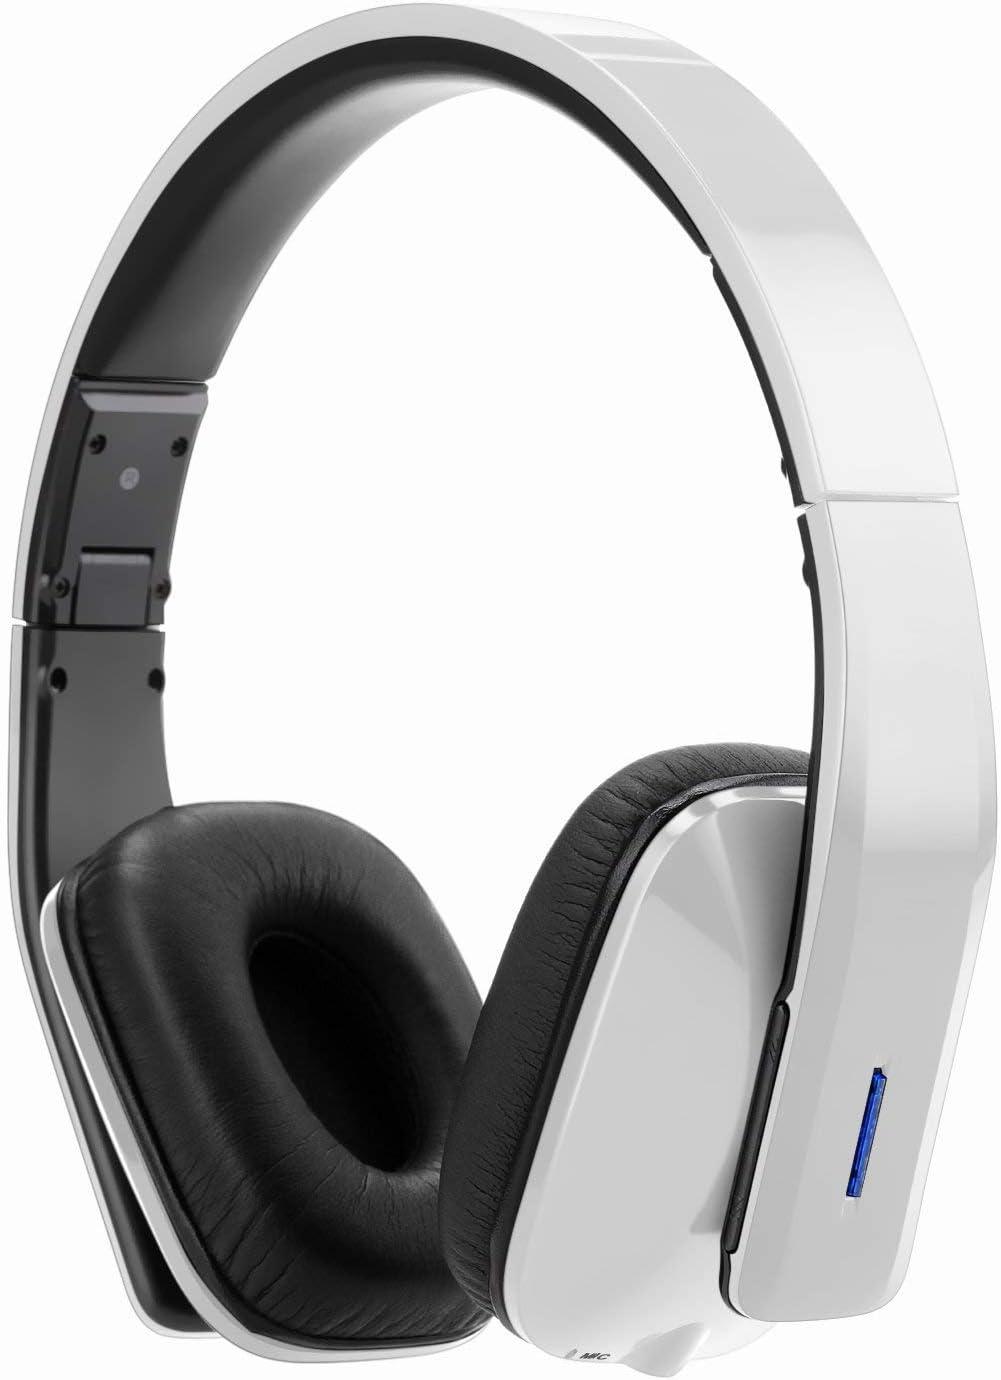 WhiteLabel On Ear Bluetooth Headphones, Standard Style (WL558+White Black)